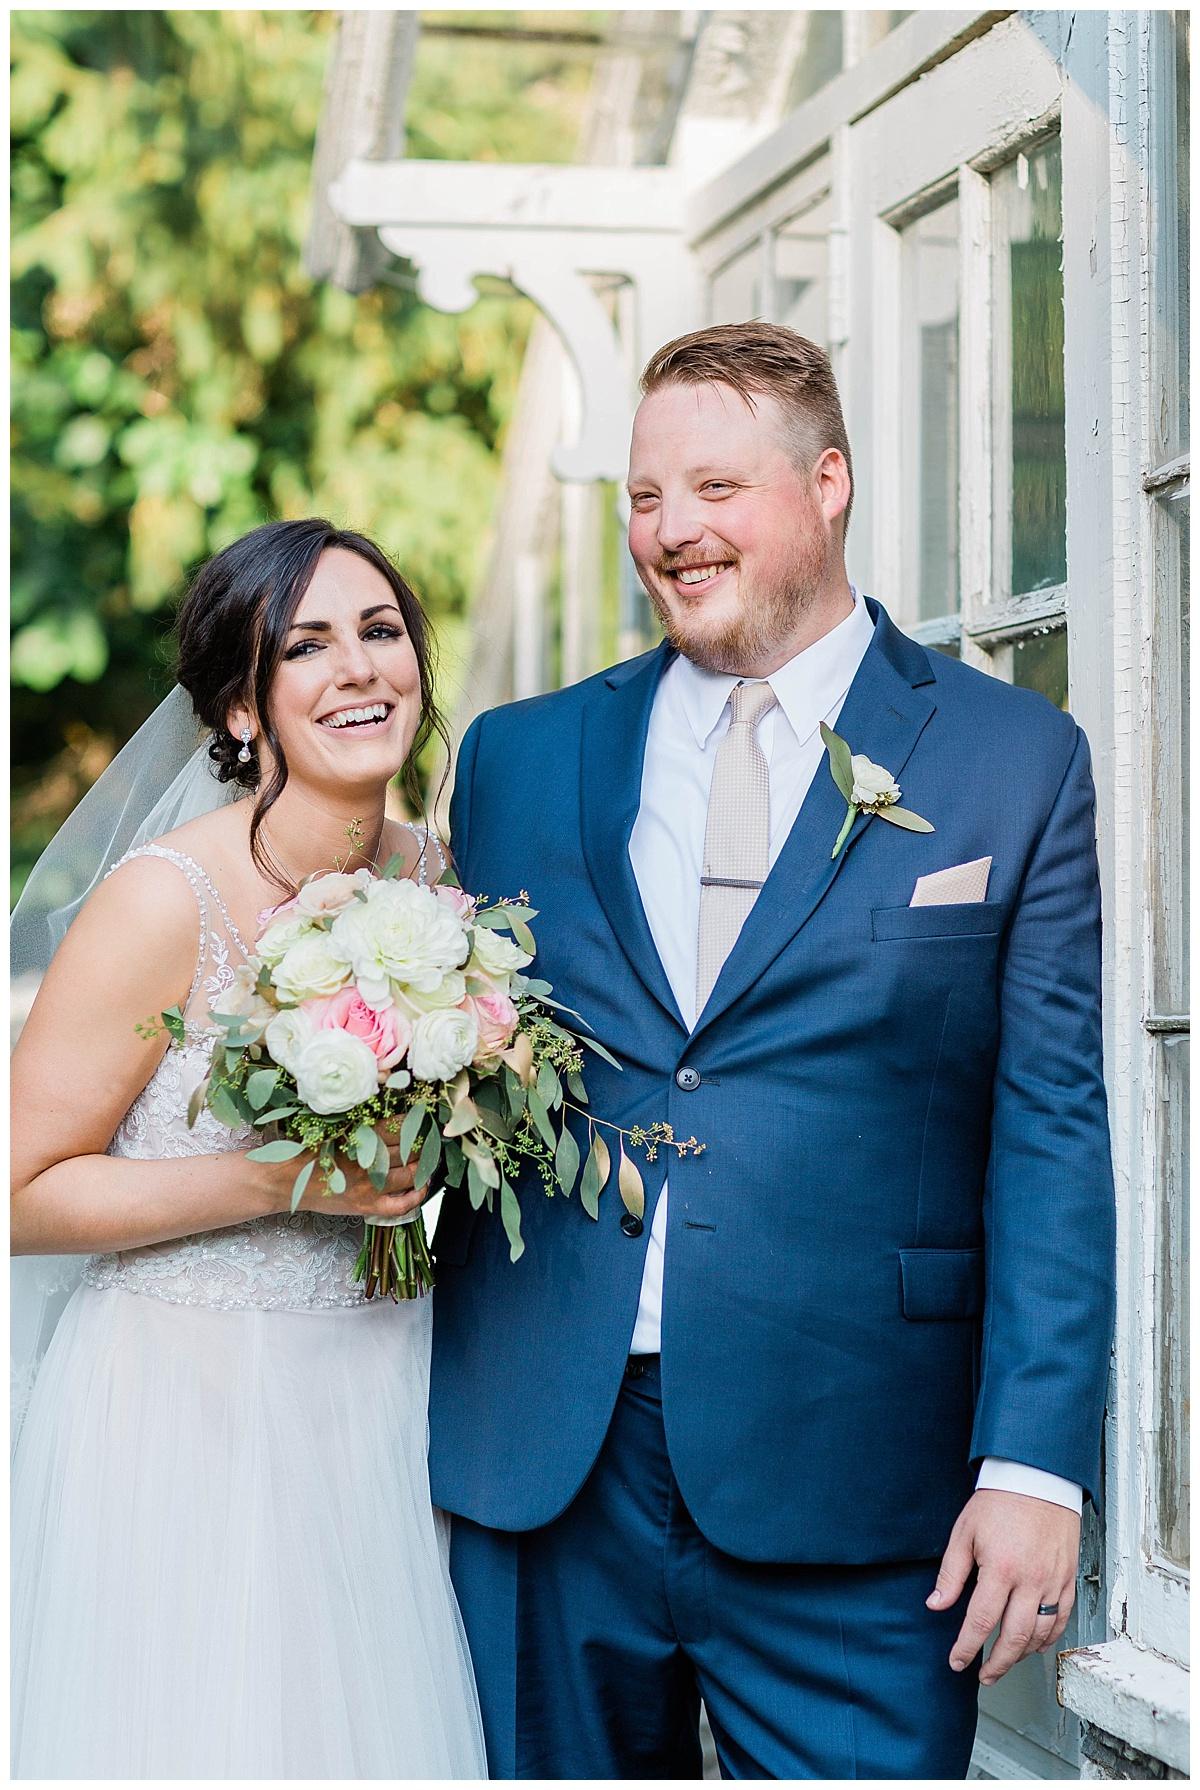 Rachel and Nick - Sonnenberg Gardens Wedding-782.jpg